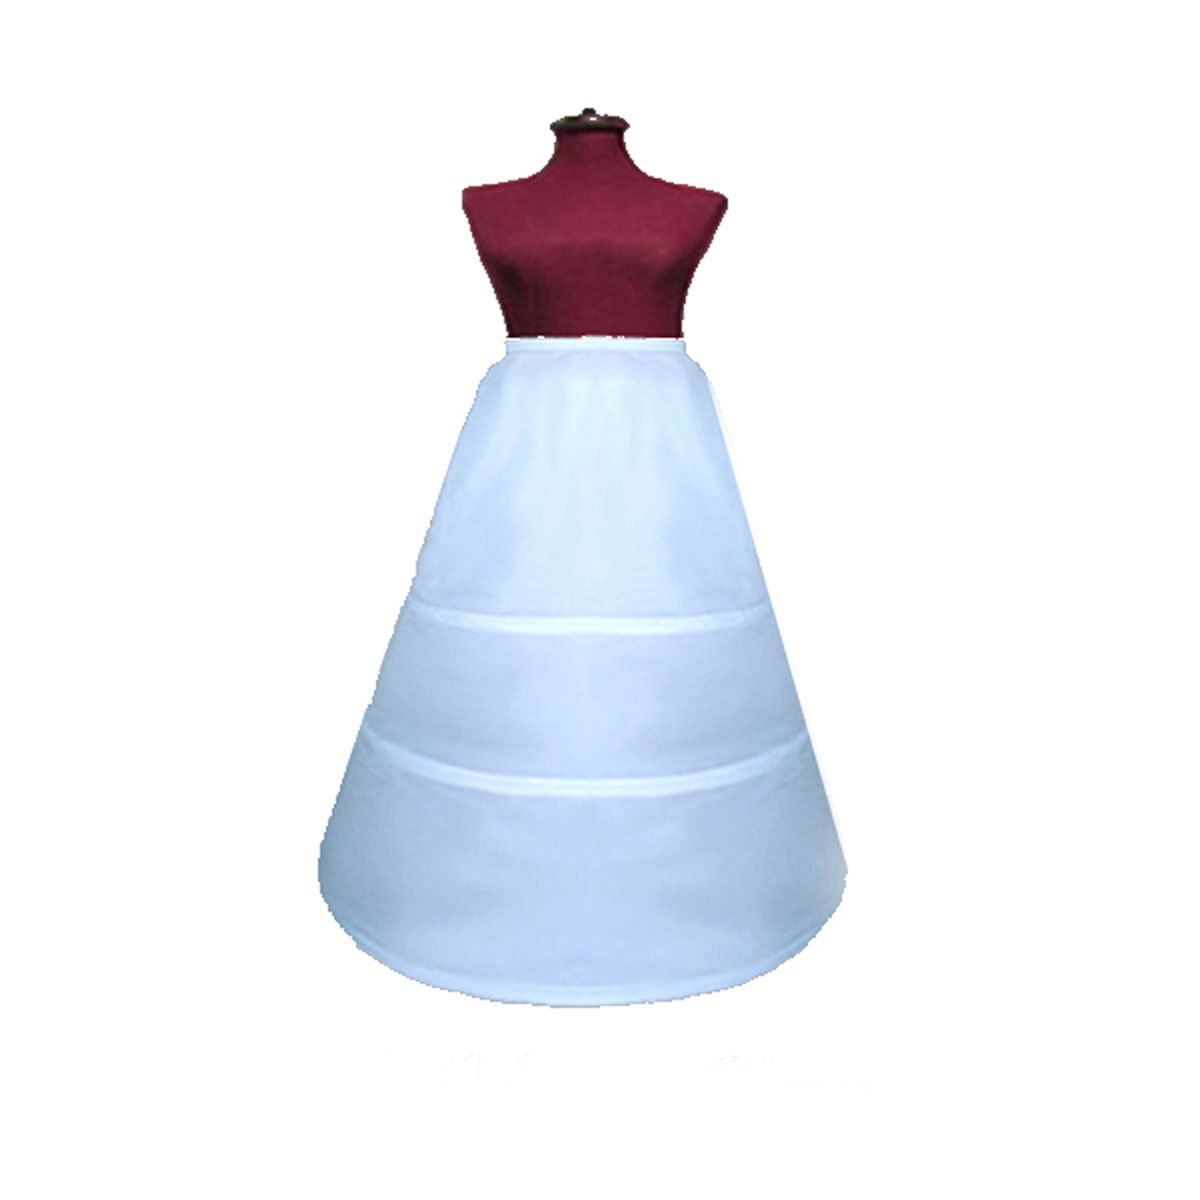 SACASUSA (TM) 3-HOOP Flower Girl Petticoat Skirt Slip S M L XL waist size up to 36''